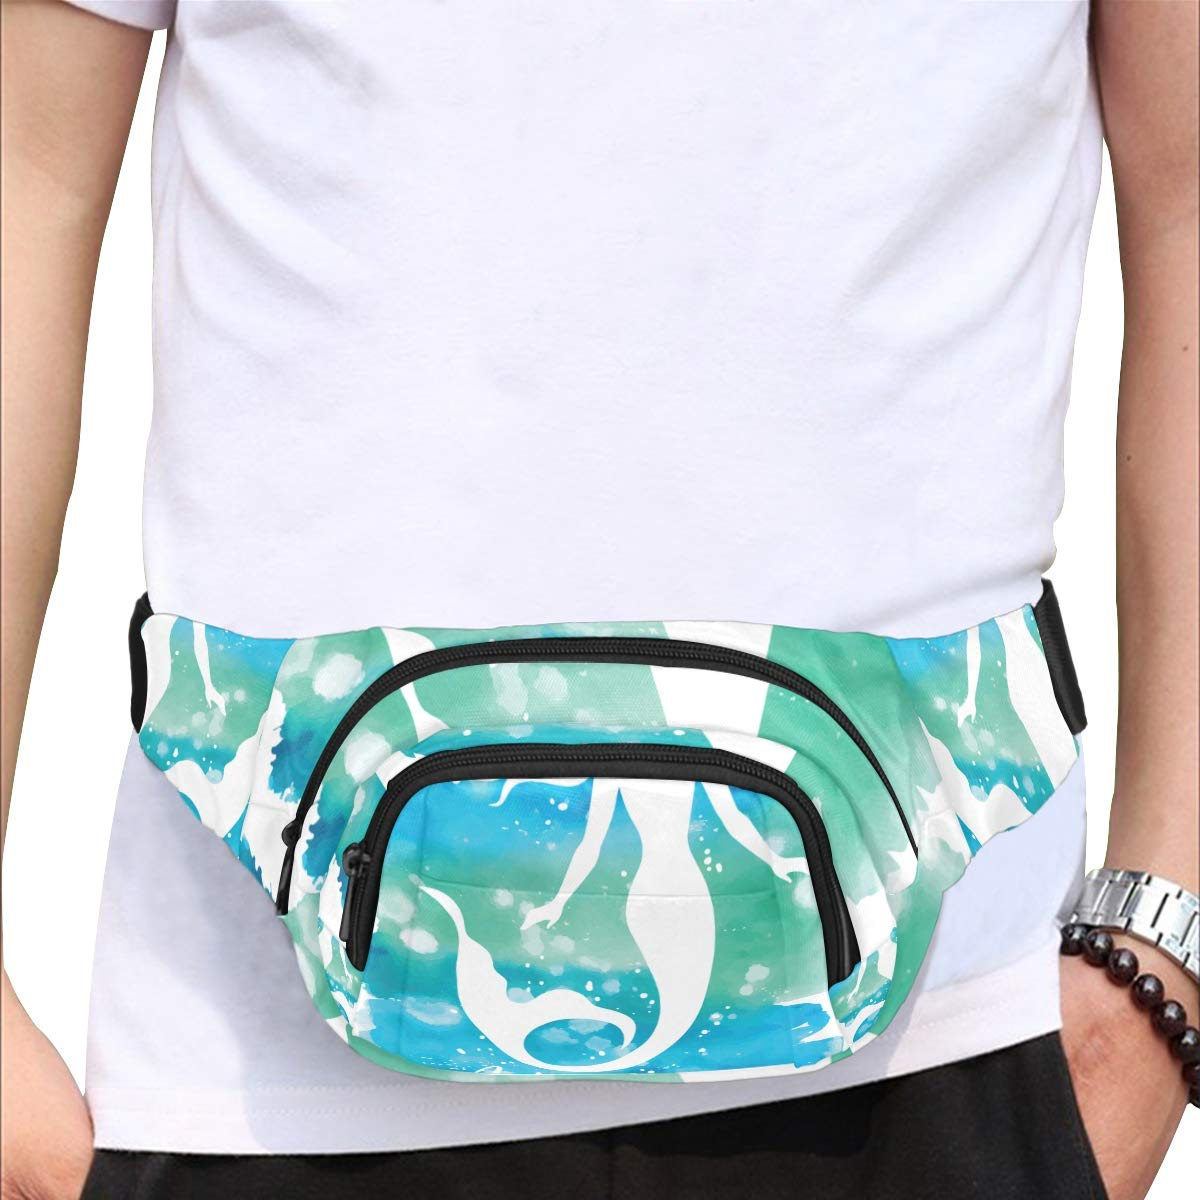 Beautiful Cute Mystical Mermaid Fenny Packs Waist Bags Adjustable Belt Waterproof Nylon Travel Running Sport Vacation Party For Men Women Boys Girls Kids